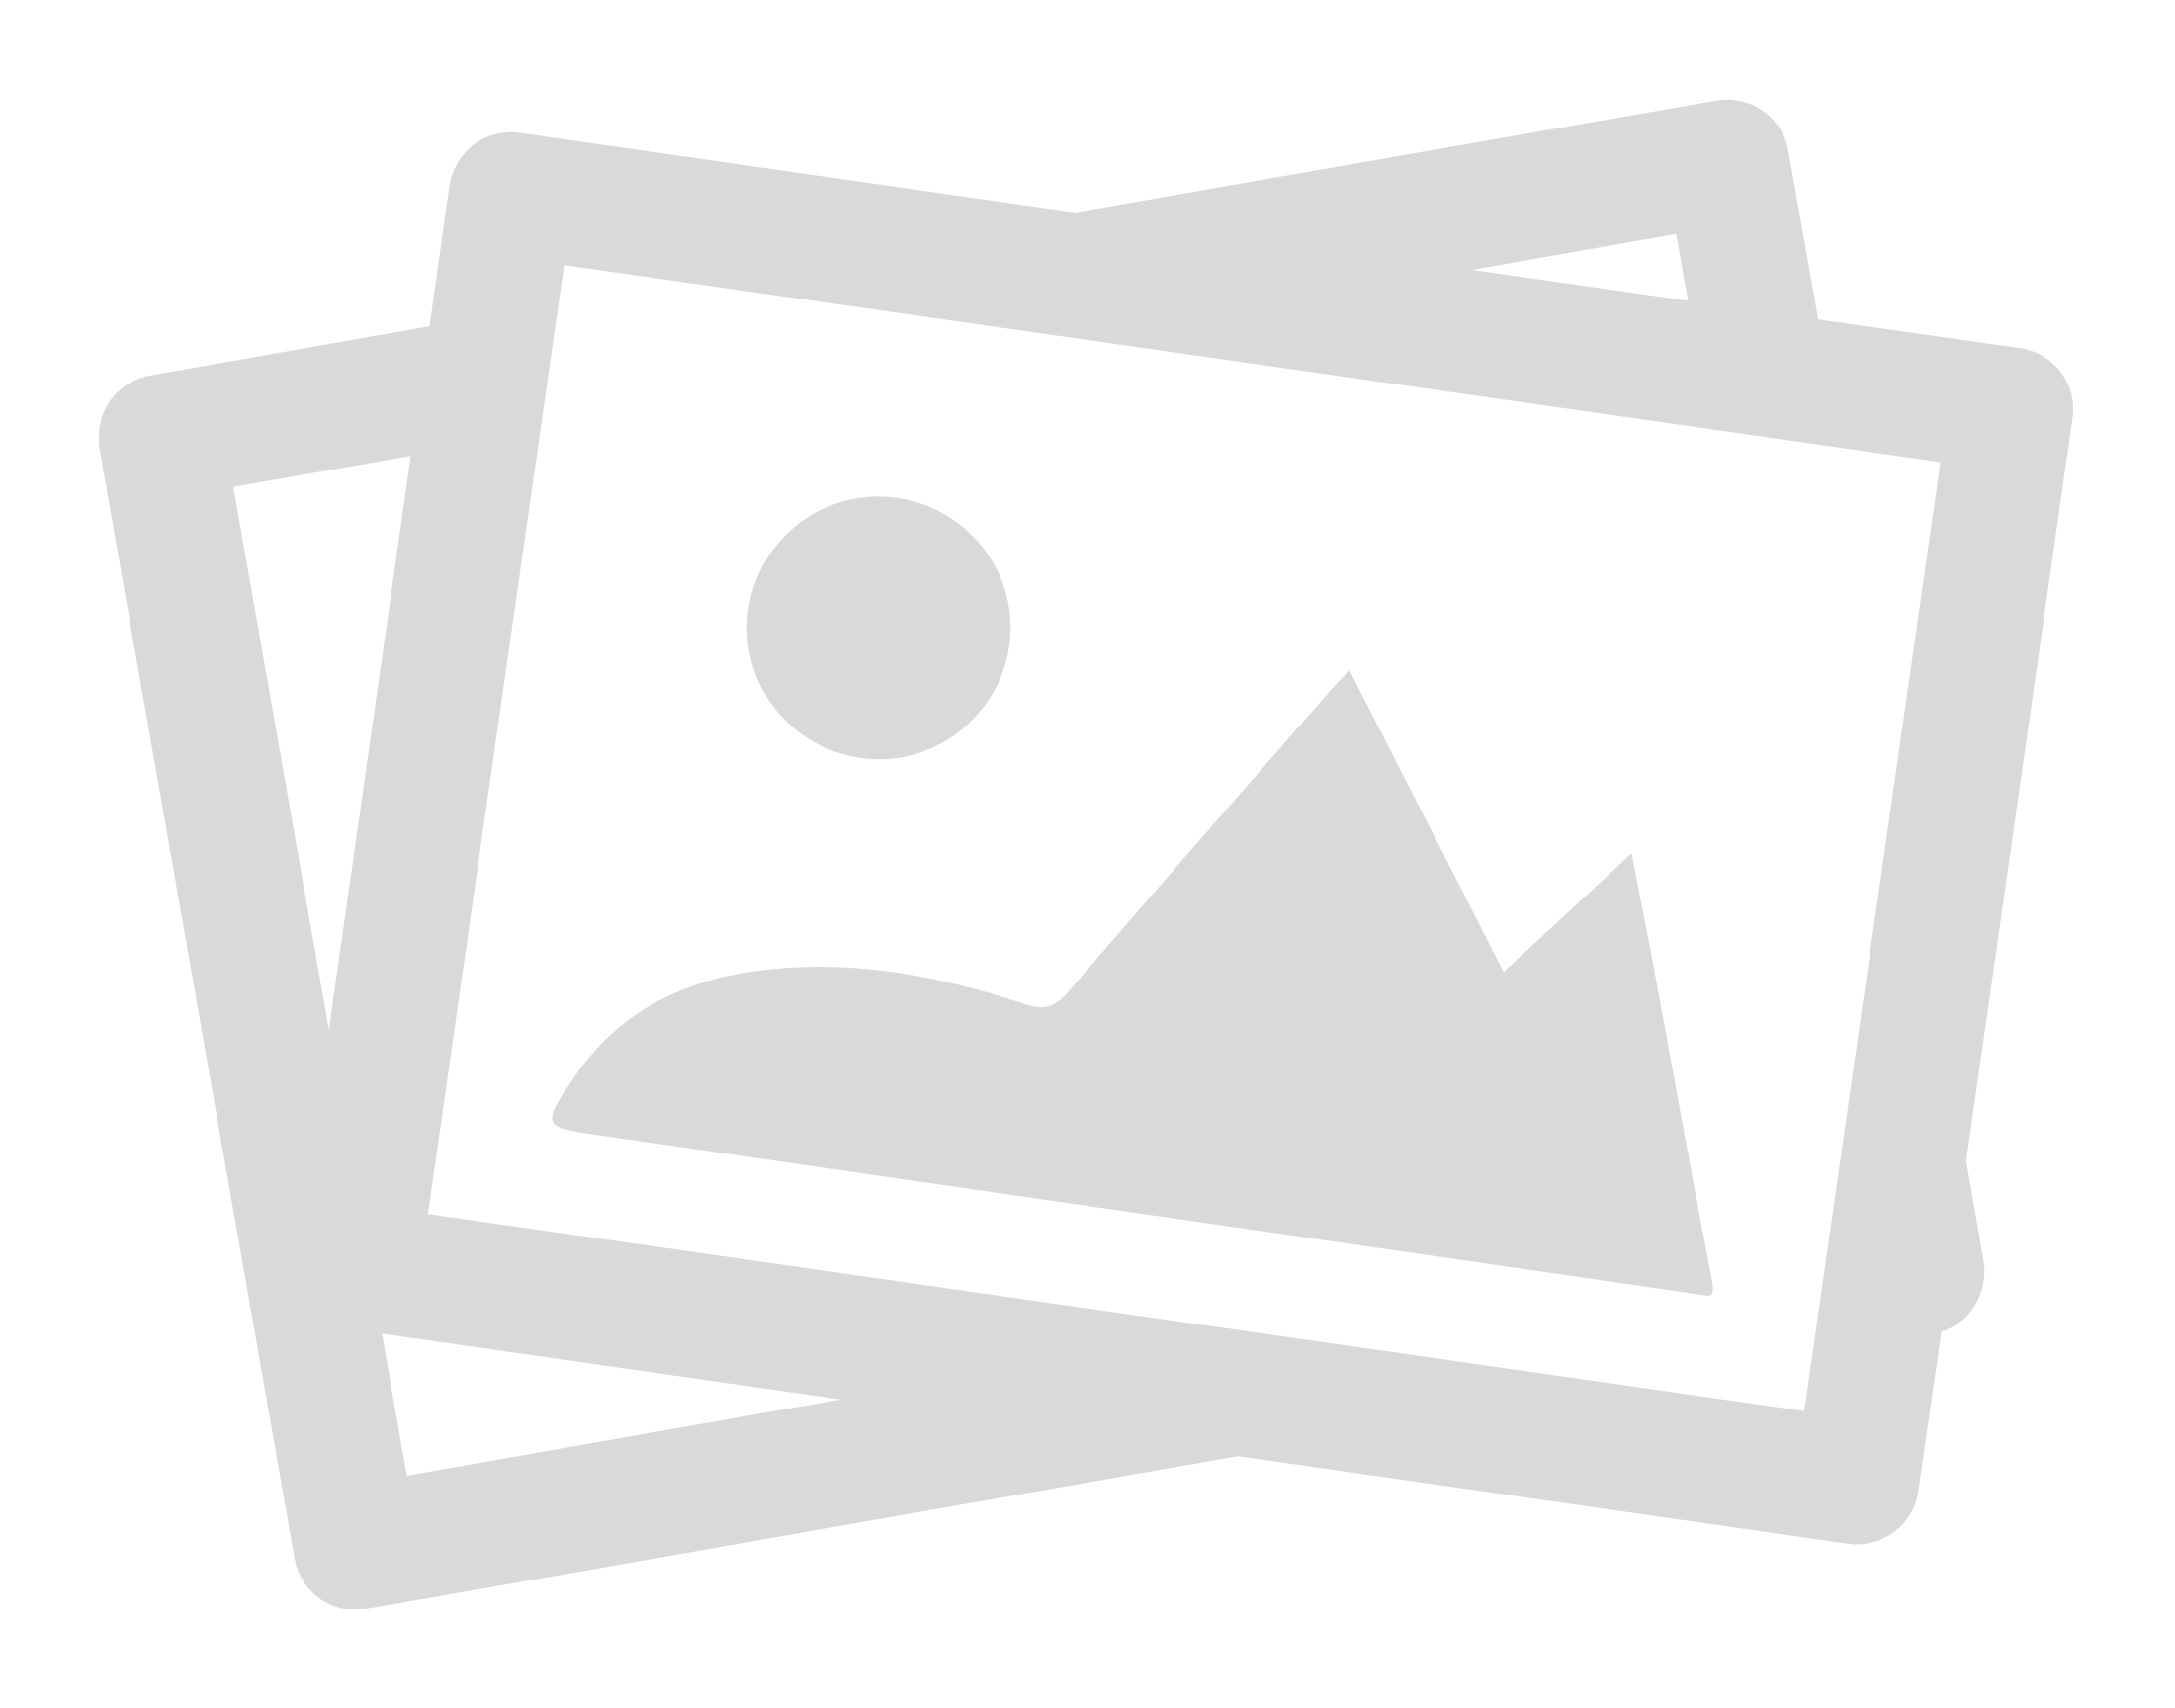 Rebelsmicrobrewery.it Inventor 2017 - ståleje Image